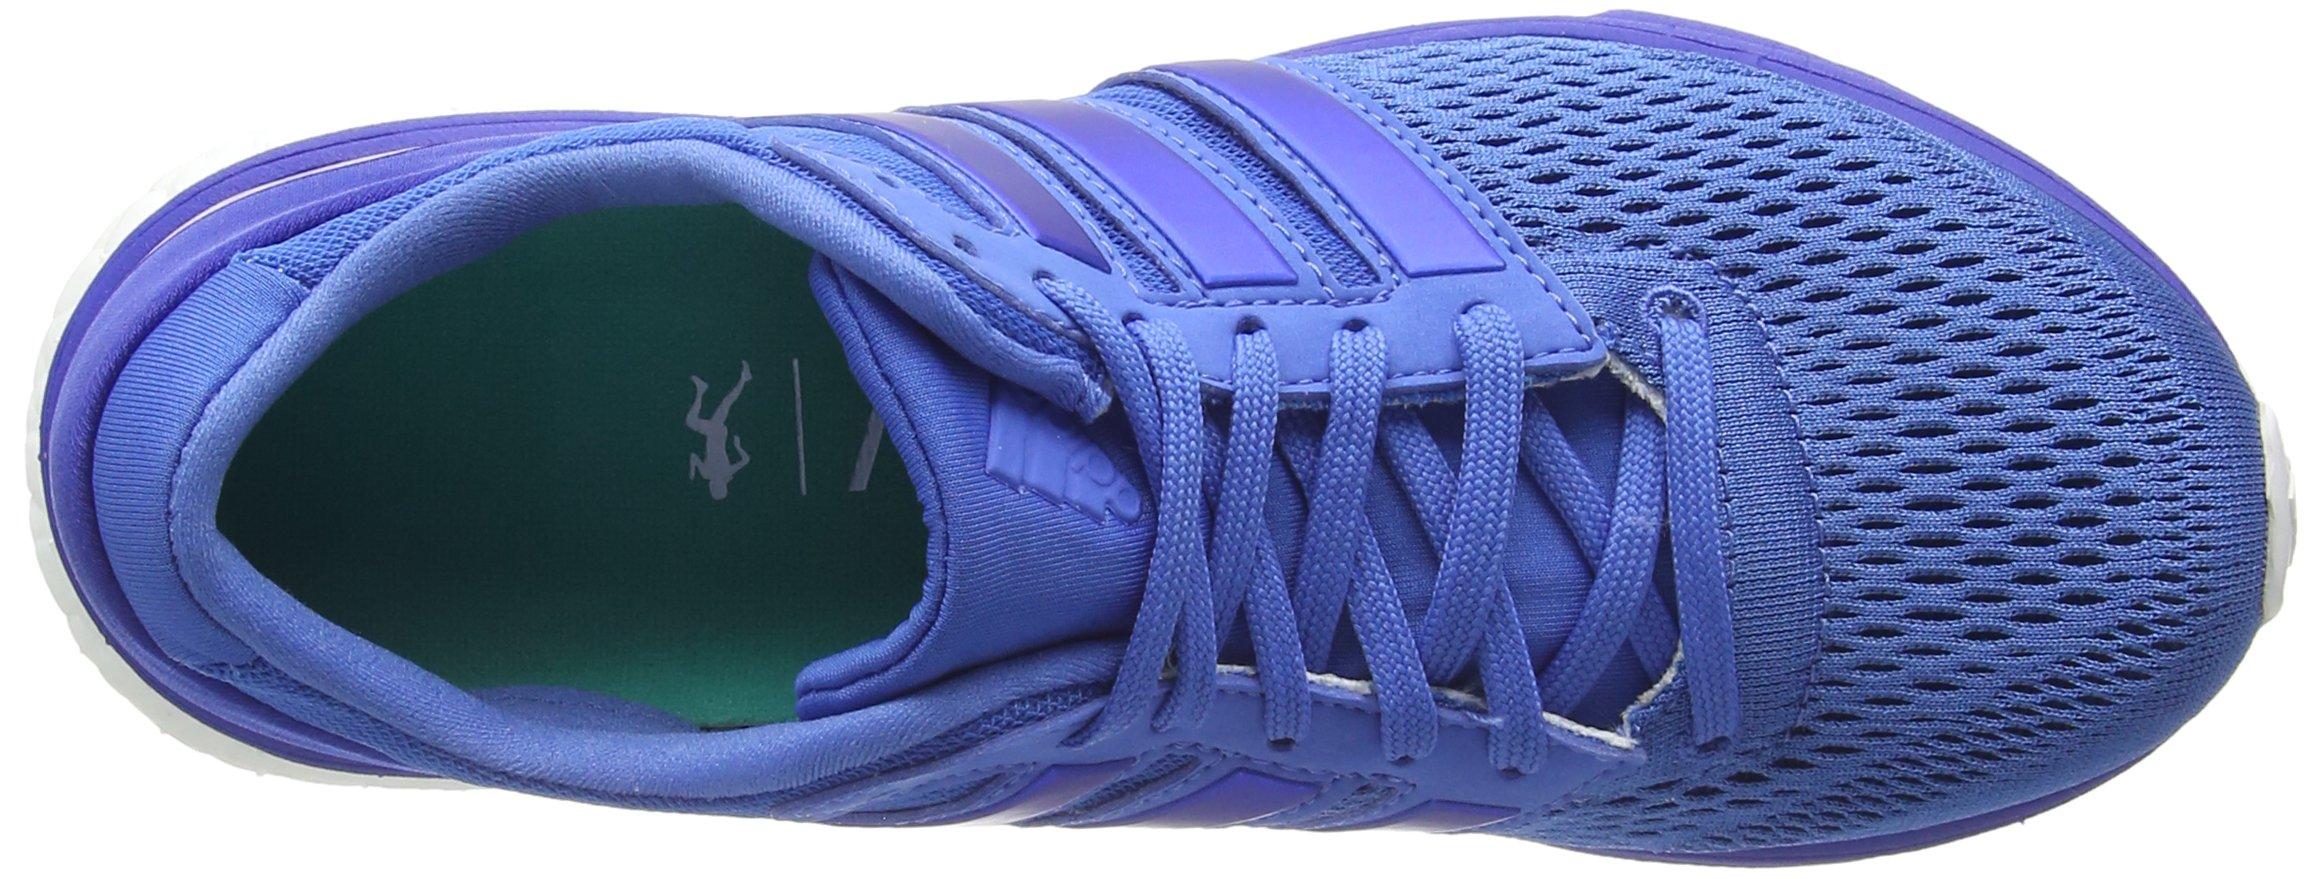 81SEpFZ4RIL - adidas Women's Adizero Boston 6 Competition Running Shoes